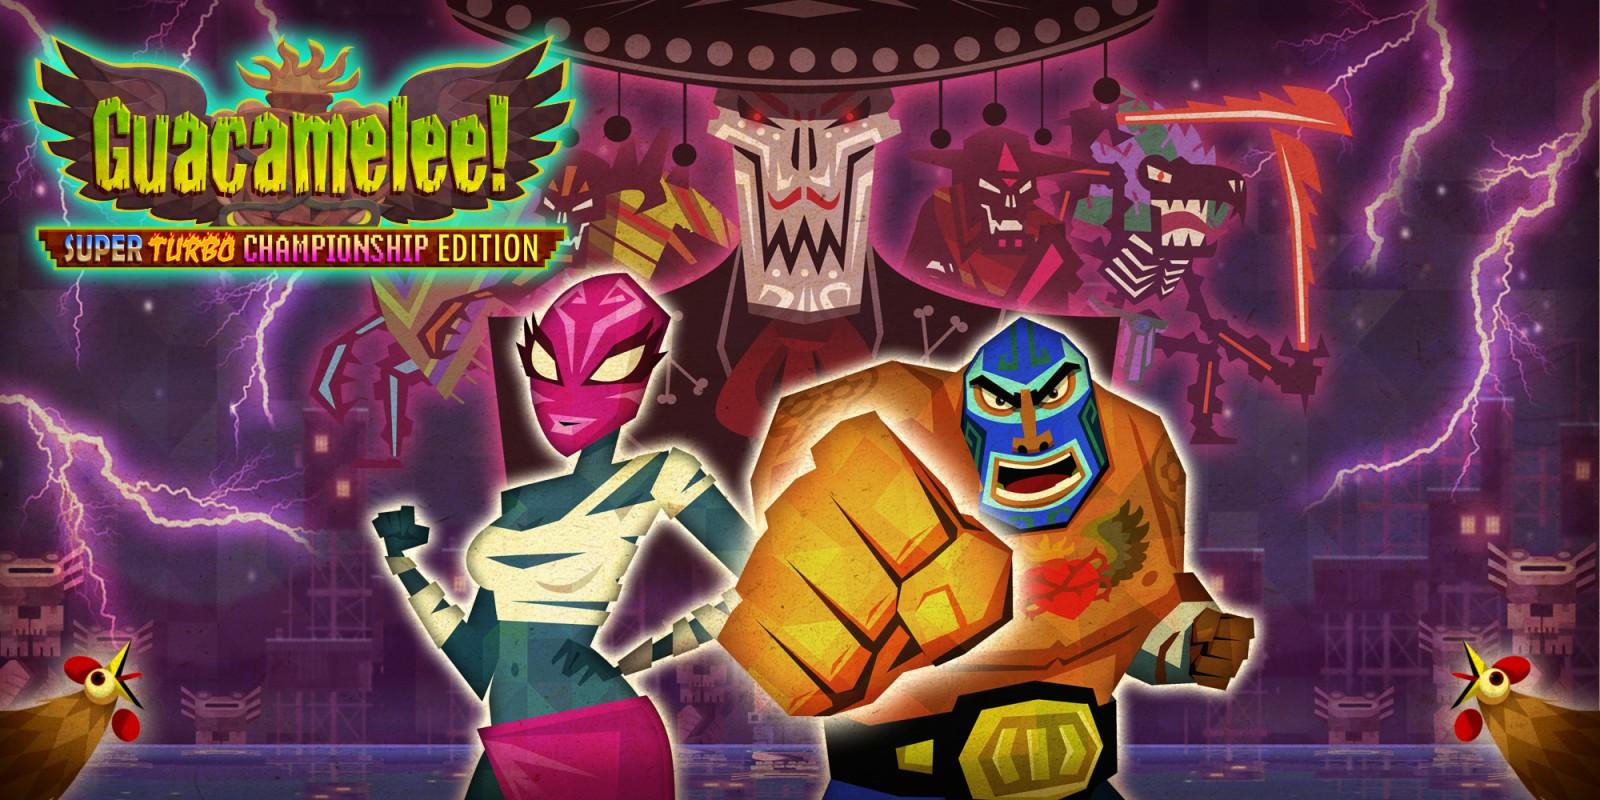 Humble Bundle rozdává Guacamelee! Super Turbo Championship Edition